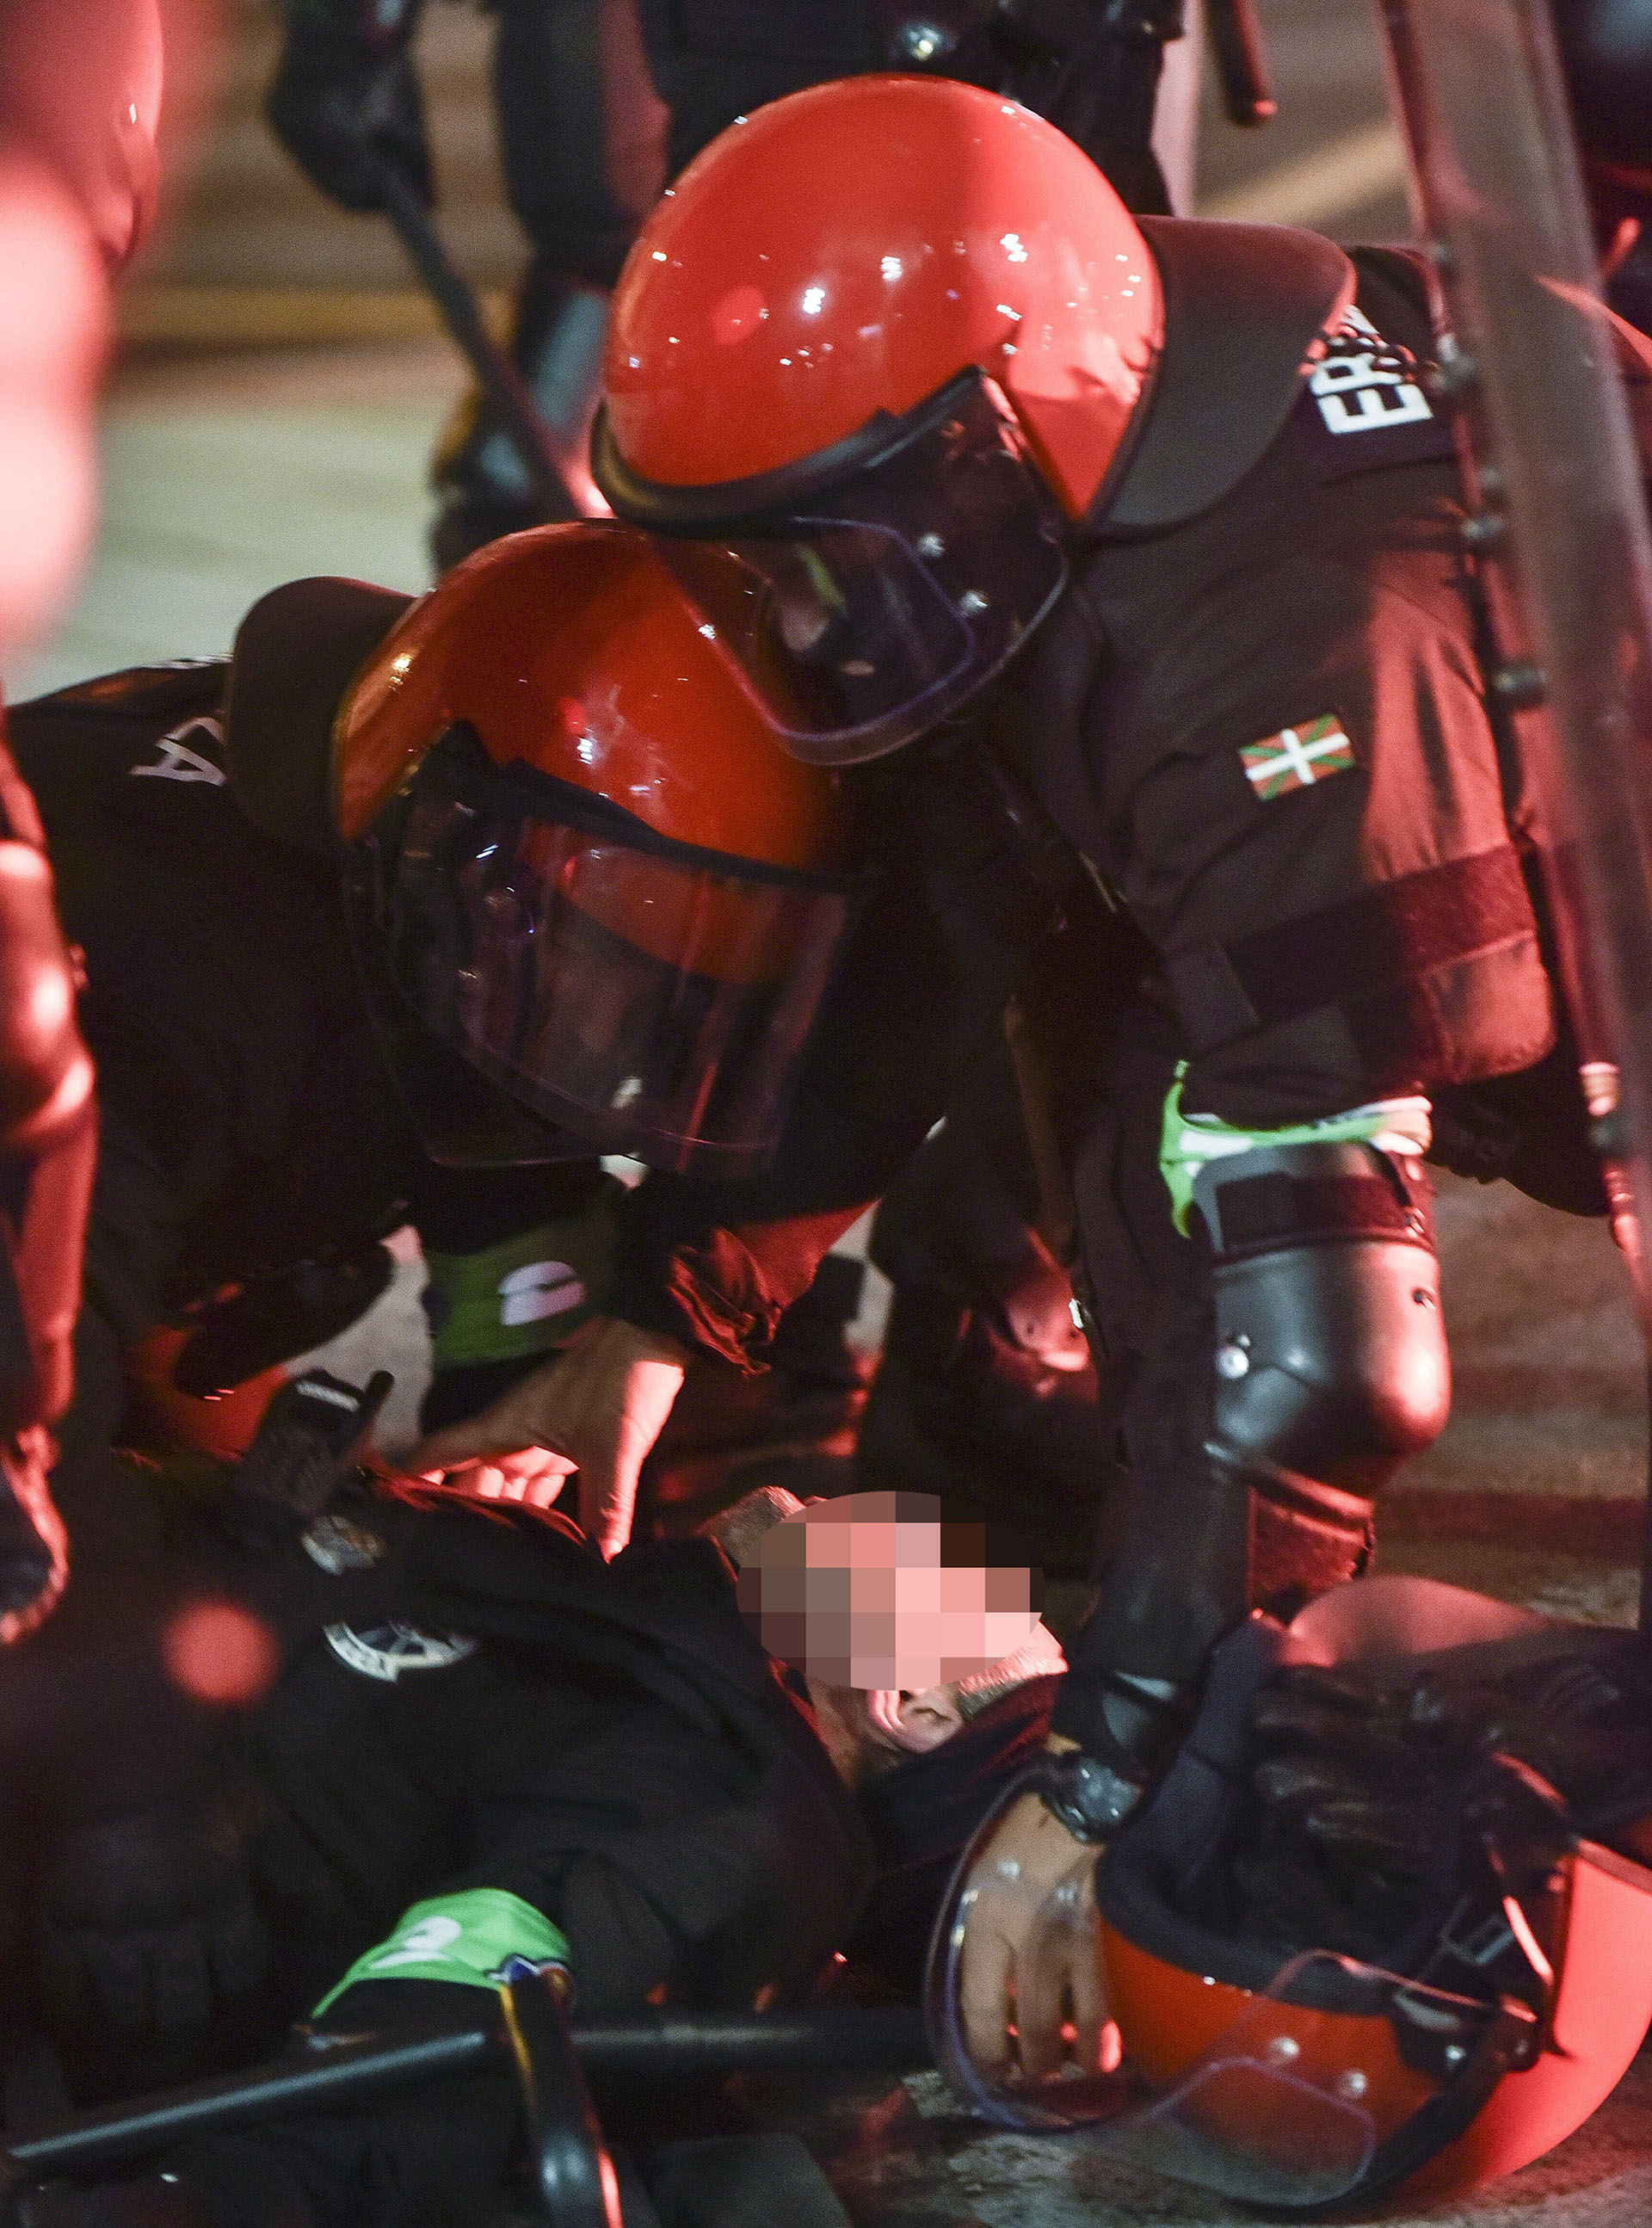 El agente pertenecía ala Ertzaintza, policía autónoma del país vasco